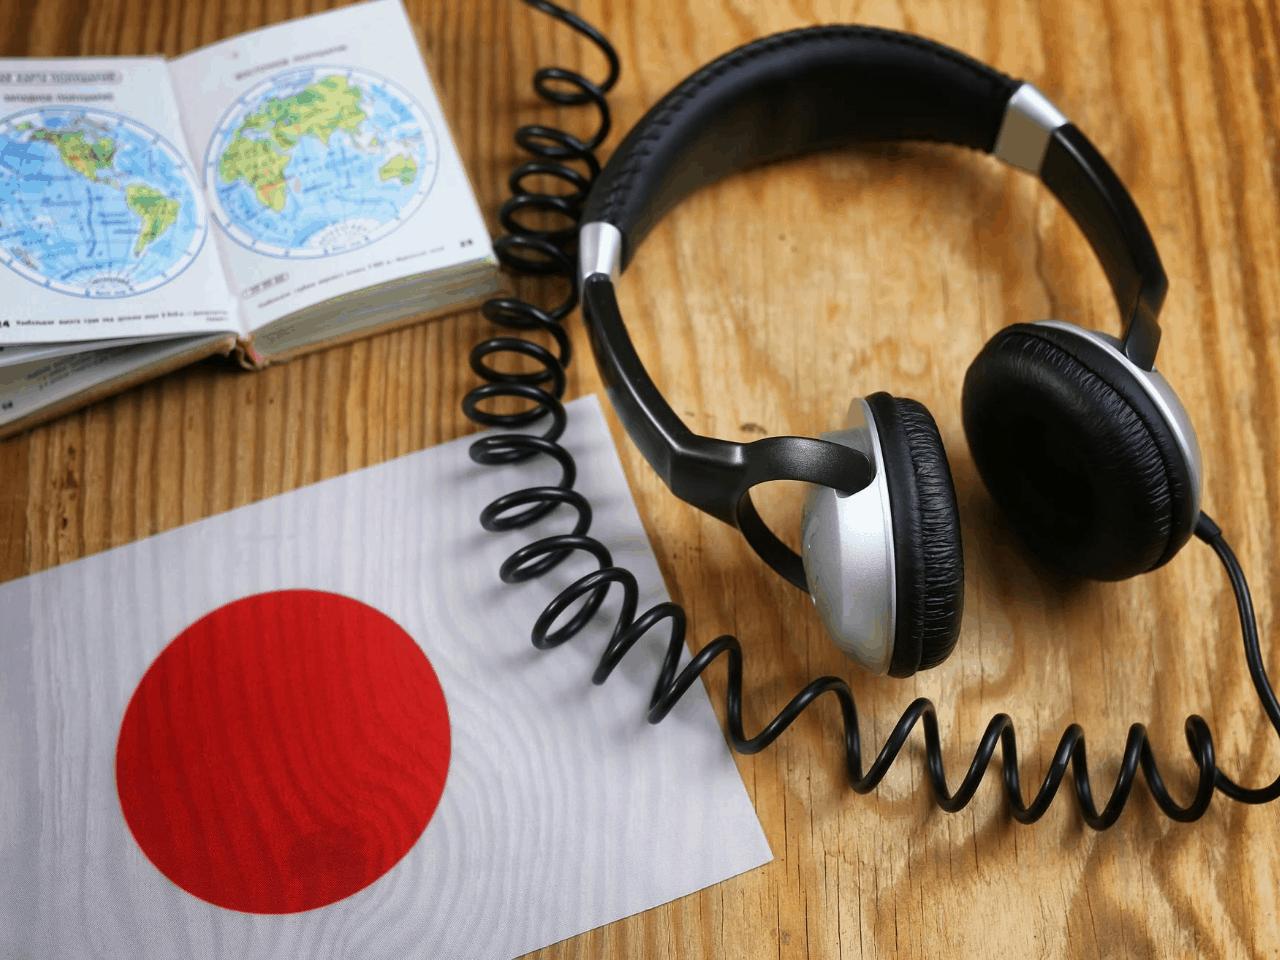 12 Mejores Apps Y Webs Para Aprender Japonés Colombian Abroad